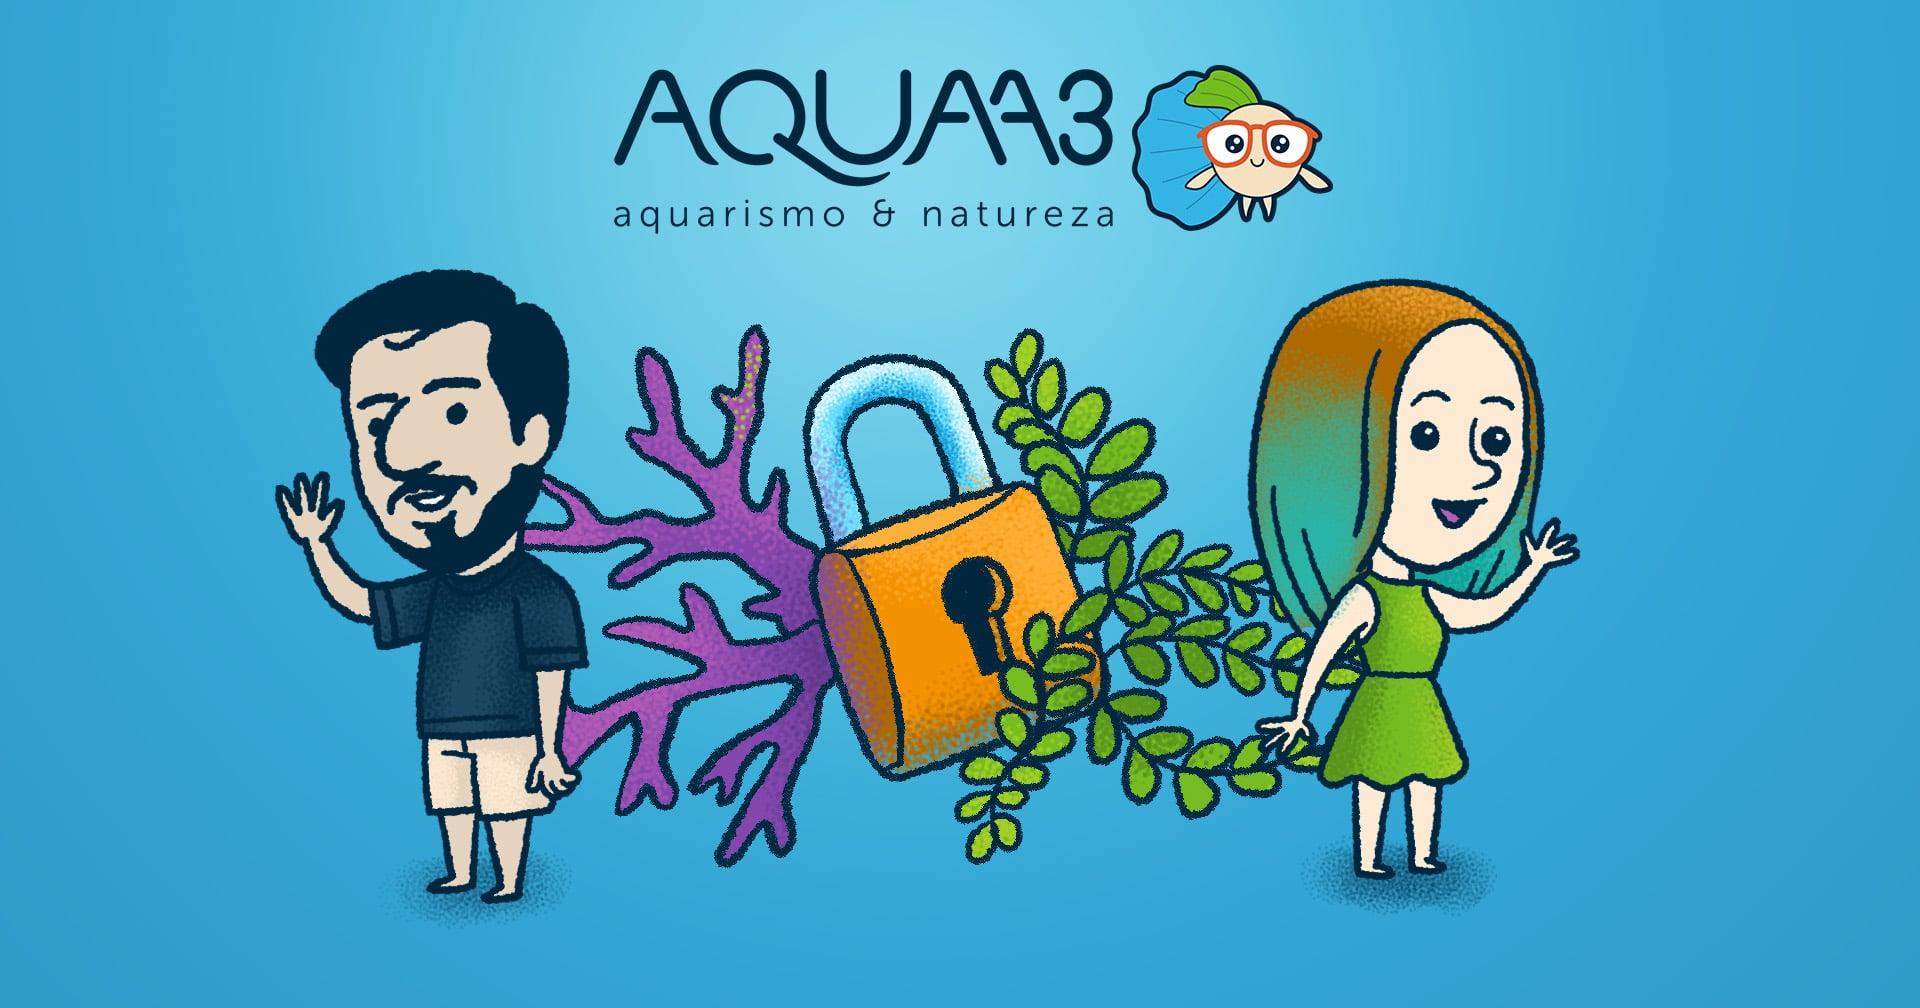 Política de privacidade AquaA3